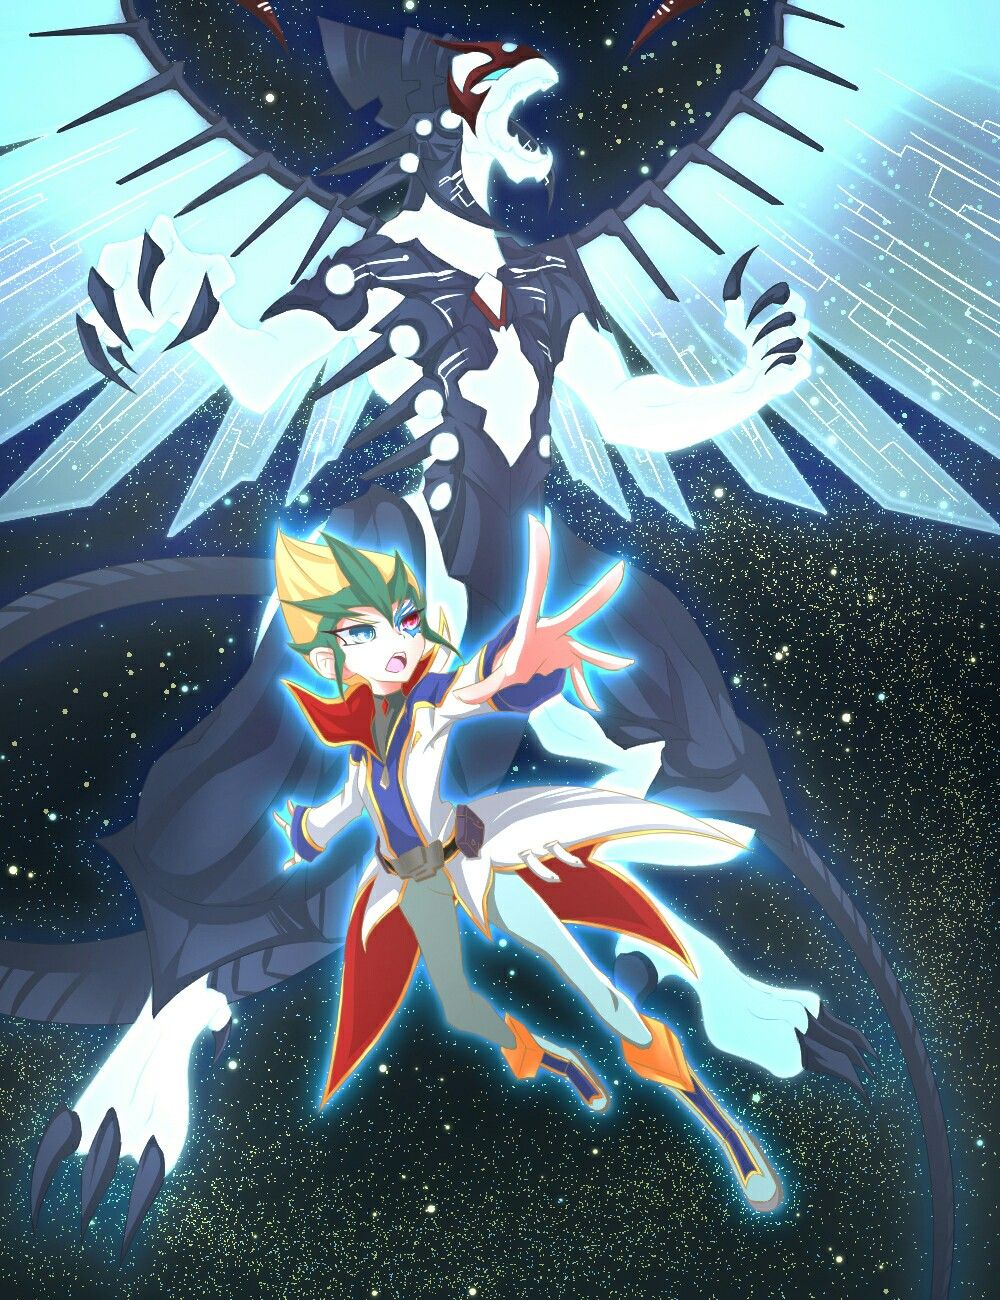 Pin By J C Drake On Yugioh Jojo S Bizarre Adventure Anime Yugioh Monsters Anime